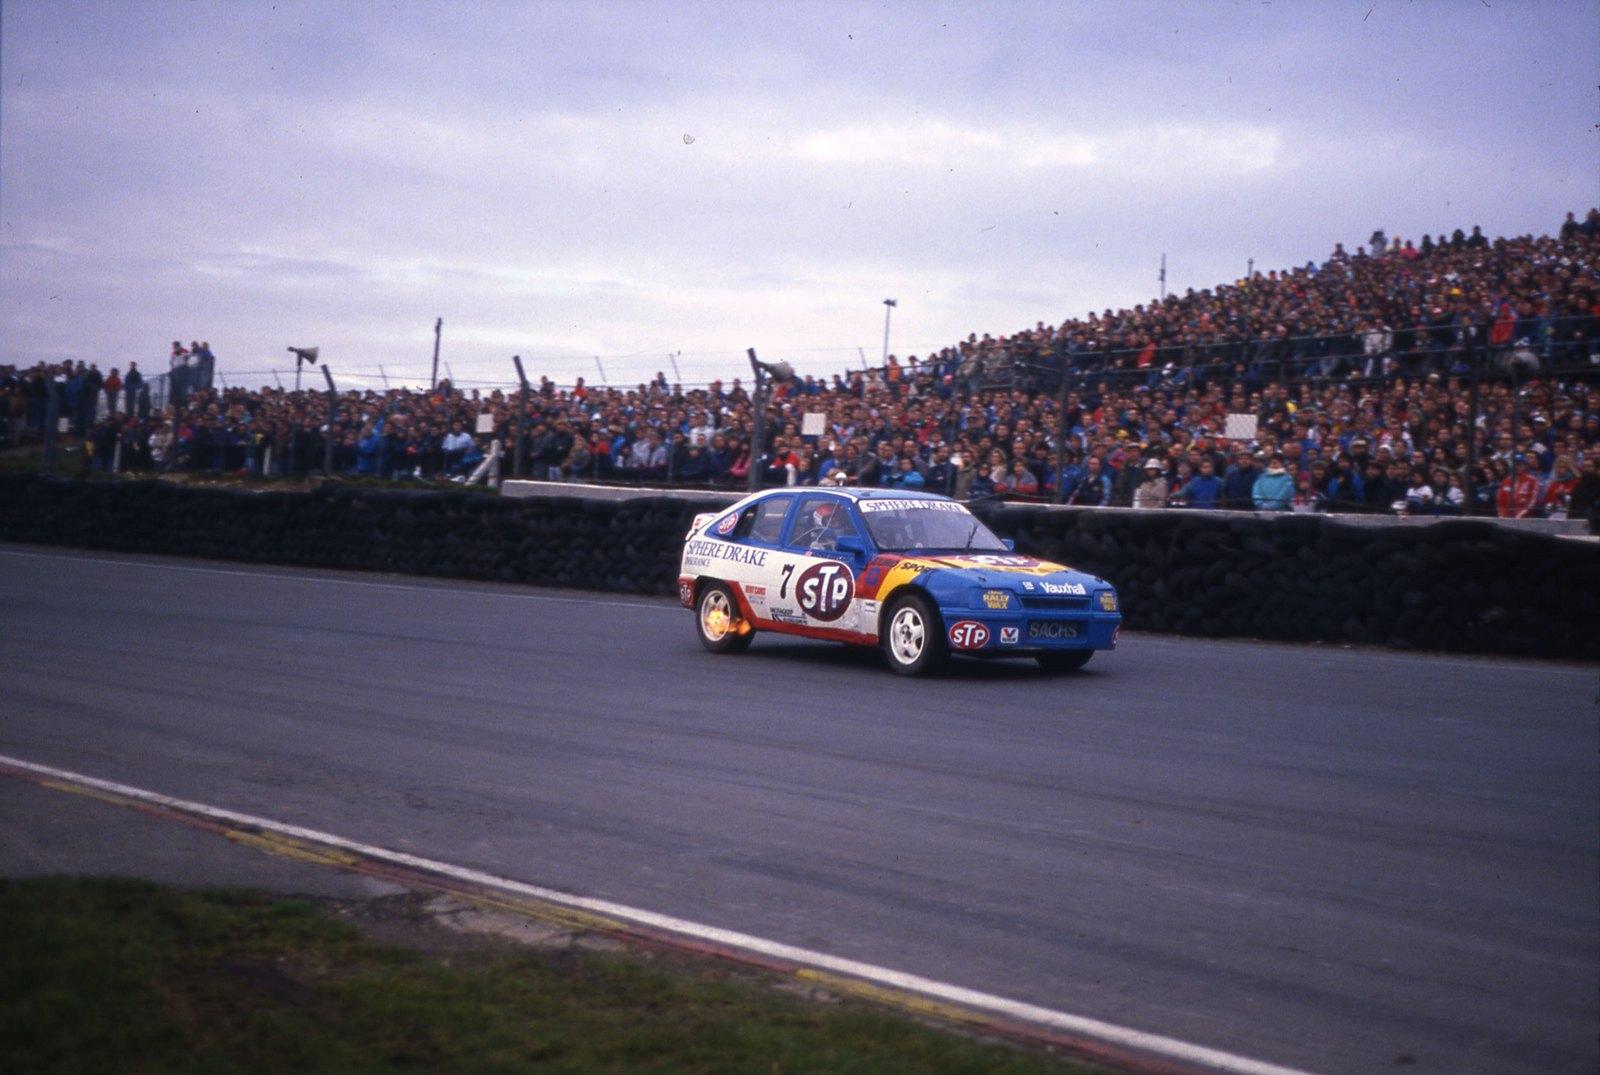 John Welch at Brands Hatch Grand Prix 1988